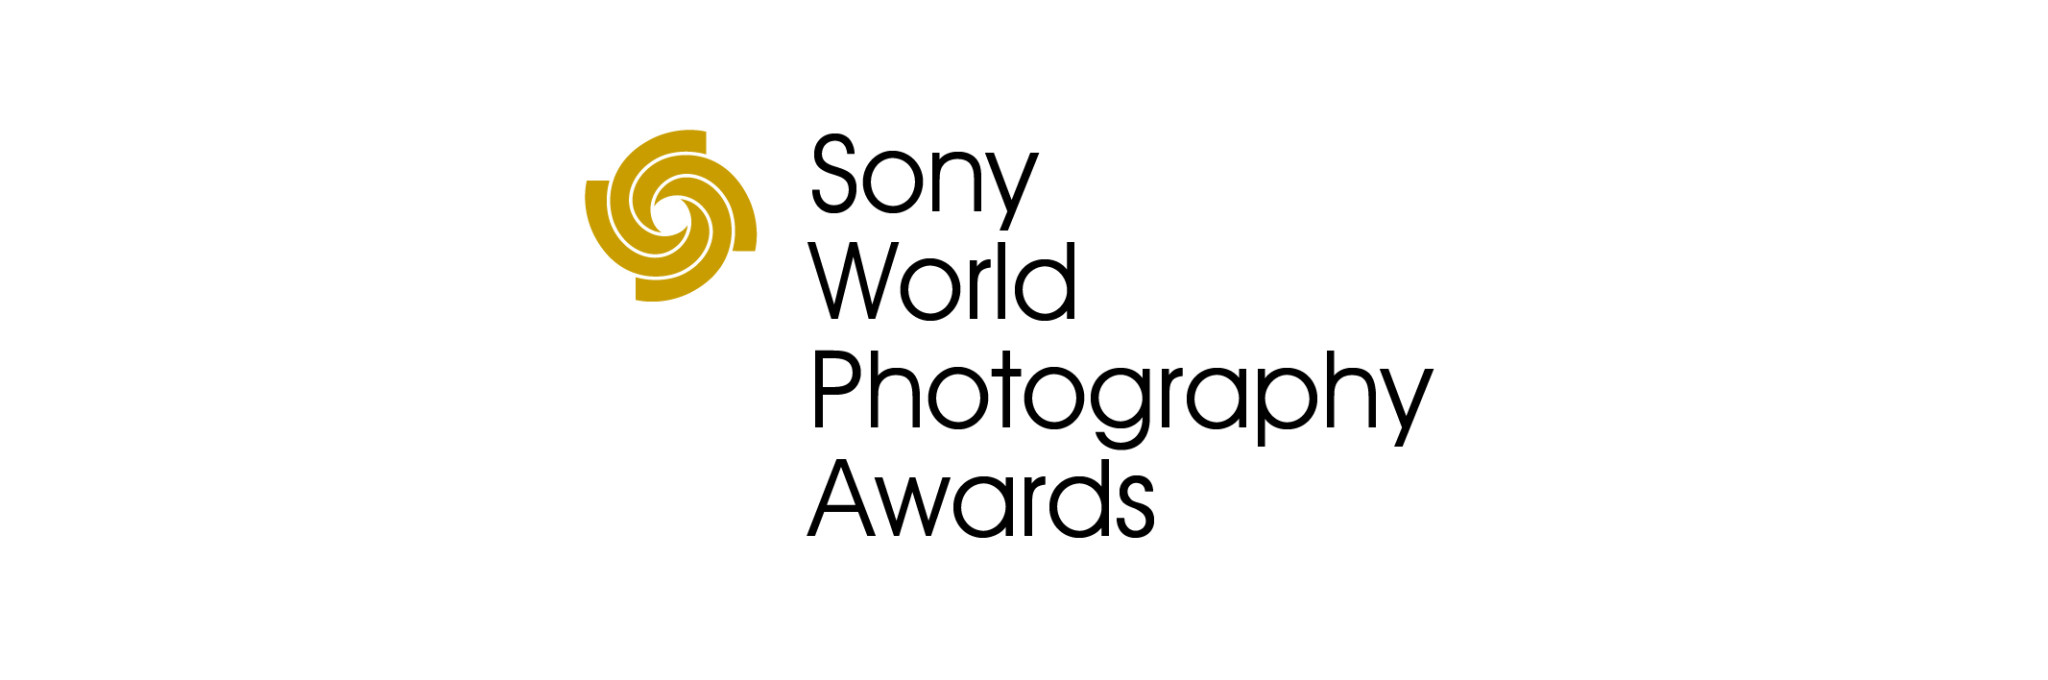 Sony World Photography Awards 2020: nuove categorie e beneficiari thumbnail